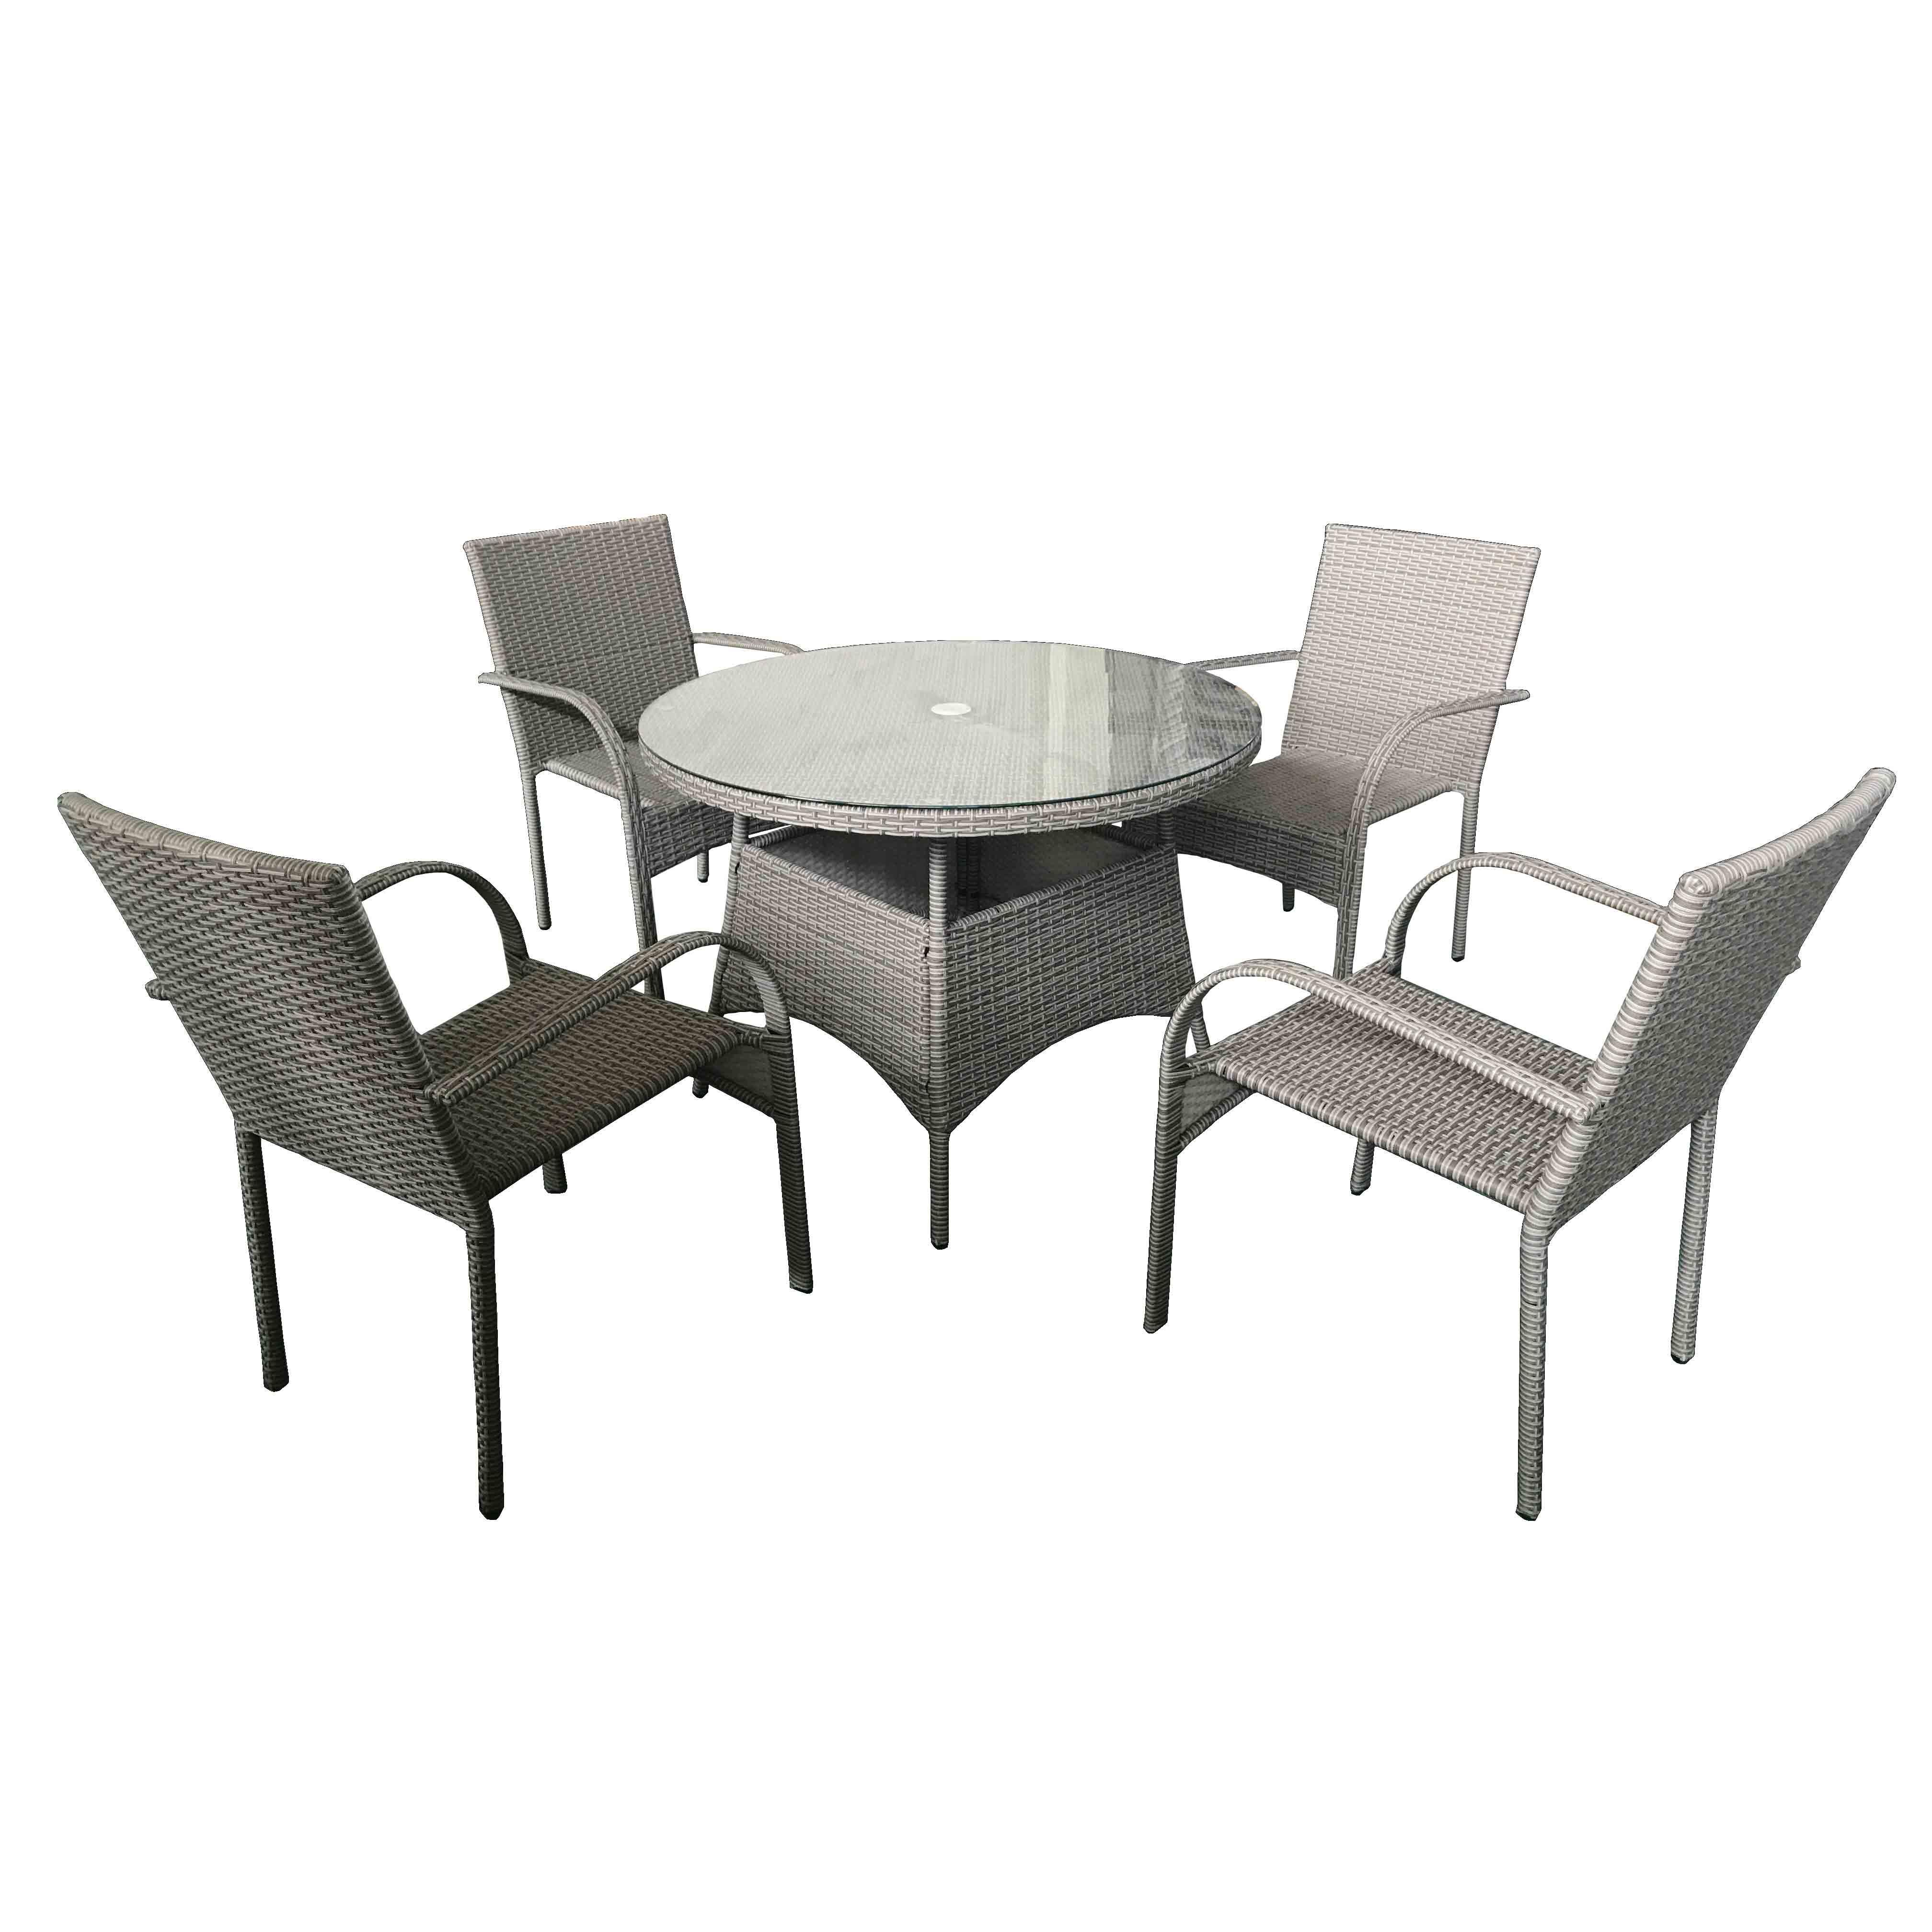 Chinese Professional Wicker Rattan Furniture Set - JJS3190W Steel frame rattan garden dinning set – Jin-jiang Industry